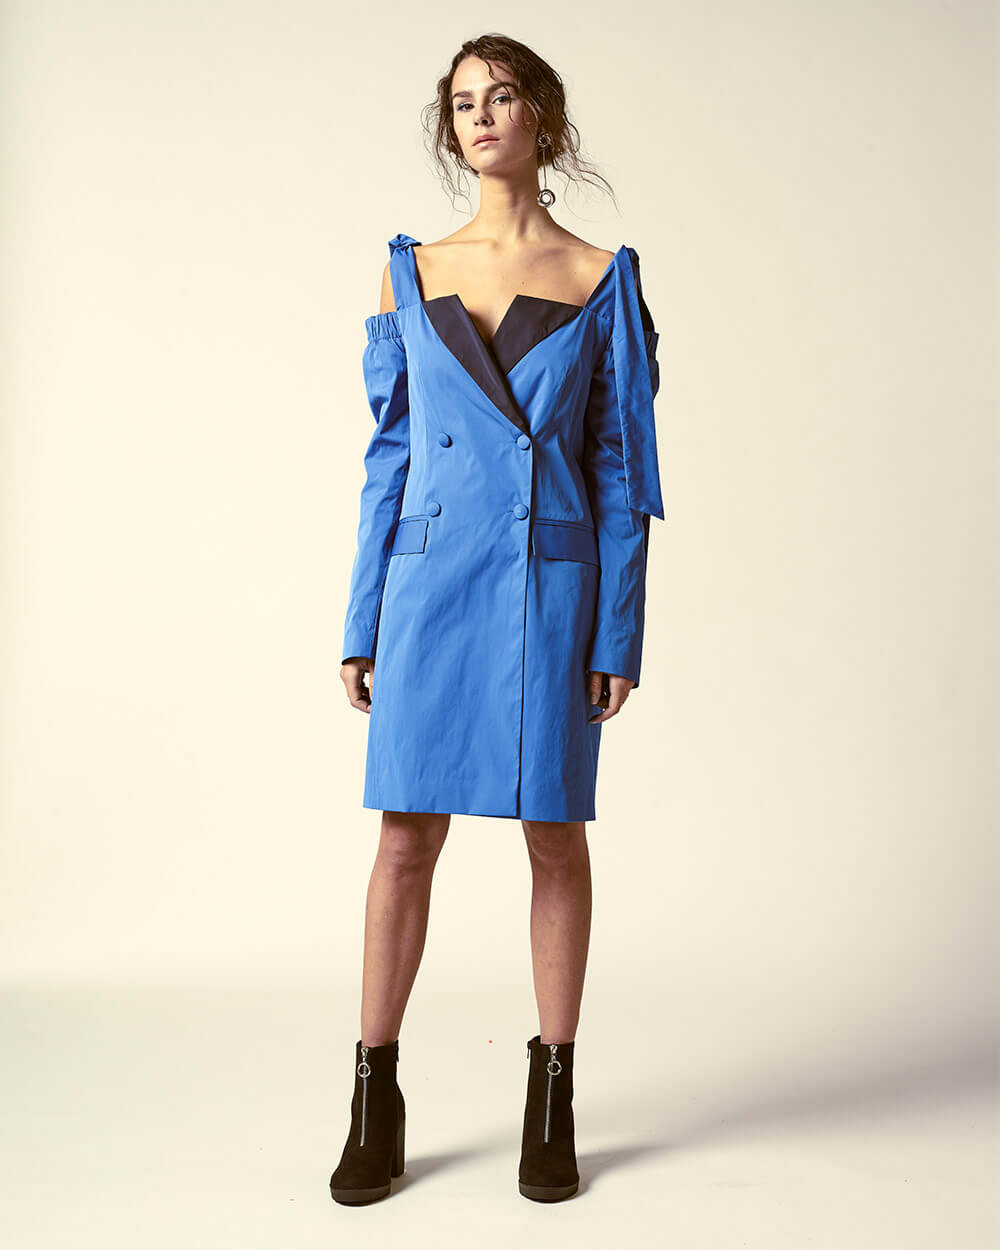 Catalina J Sustainable clothing brand